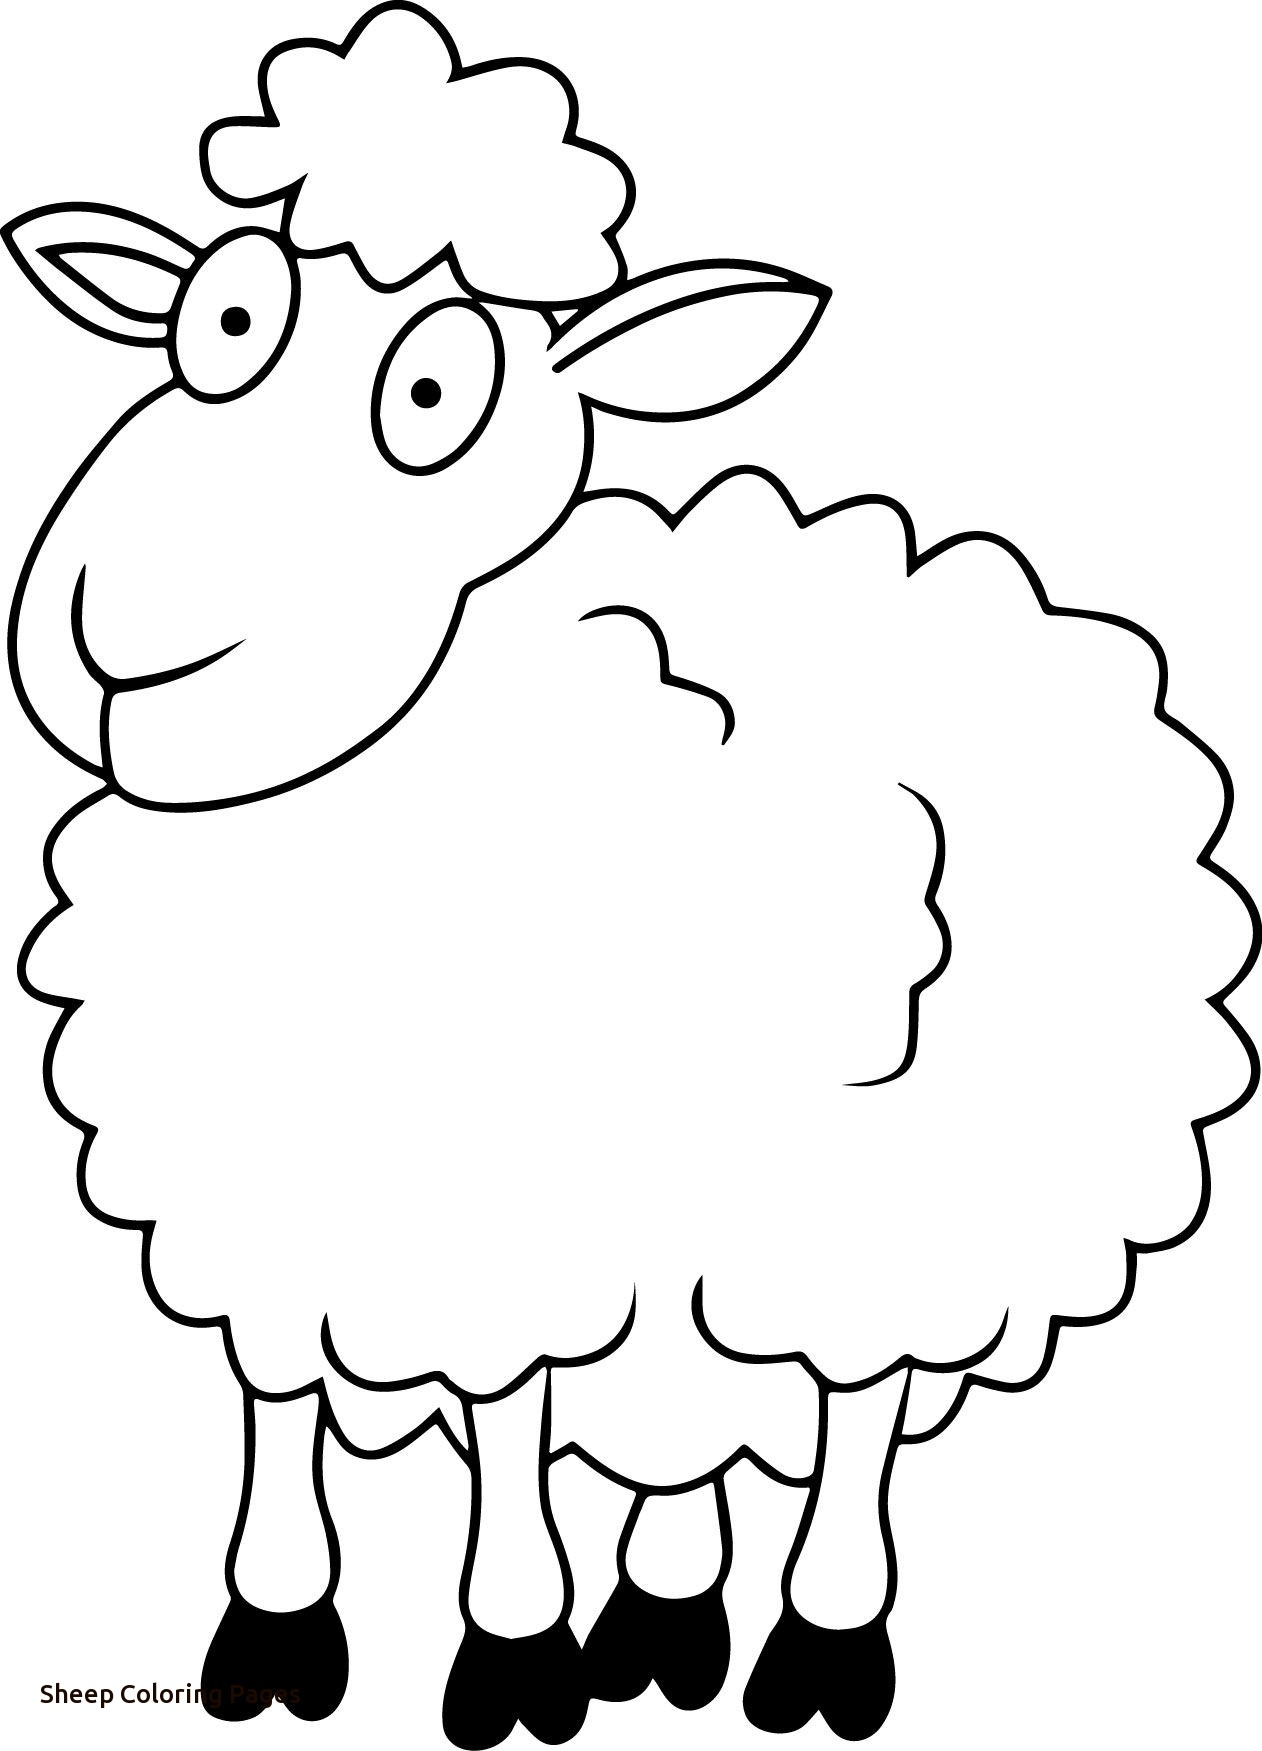 Lamb Outline Drawing at GetDrawings.com | Free for personal use Lamb ... for lamb drawing outline  565ane